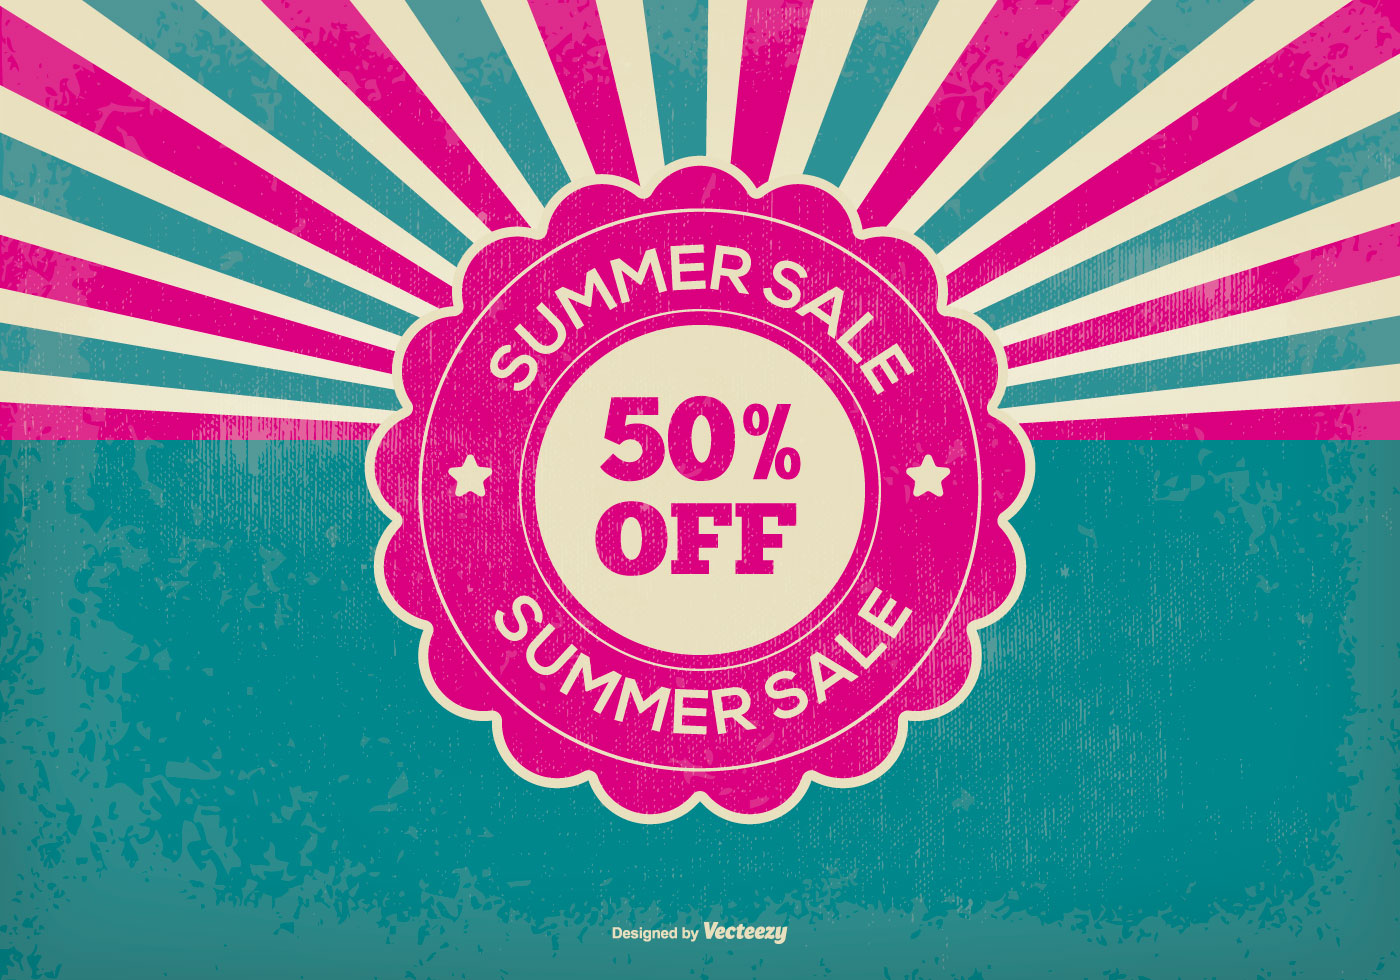 Retro Summer Sale Illustration - Download Free Vectors ...